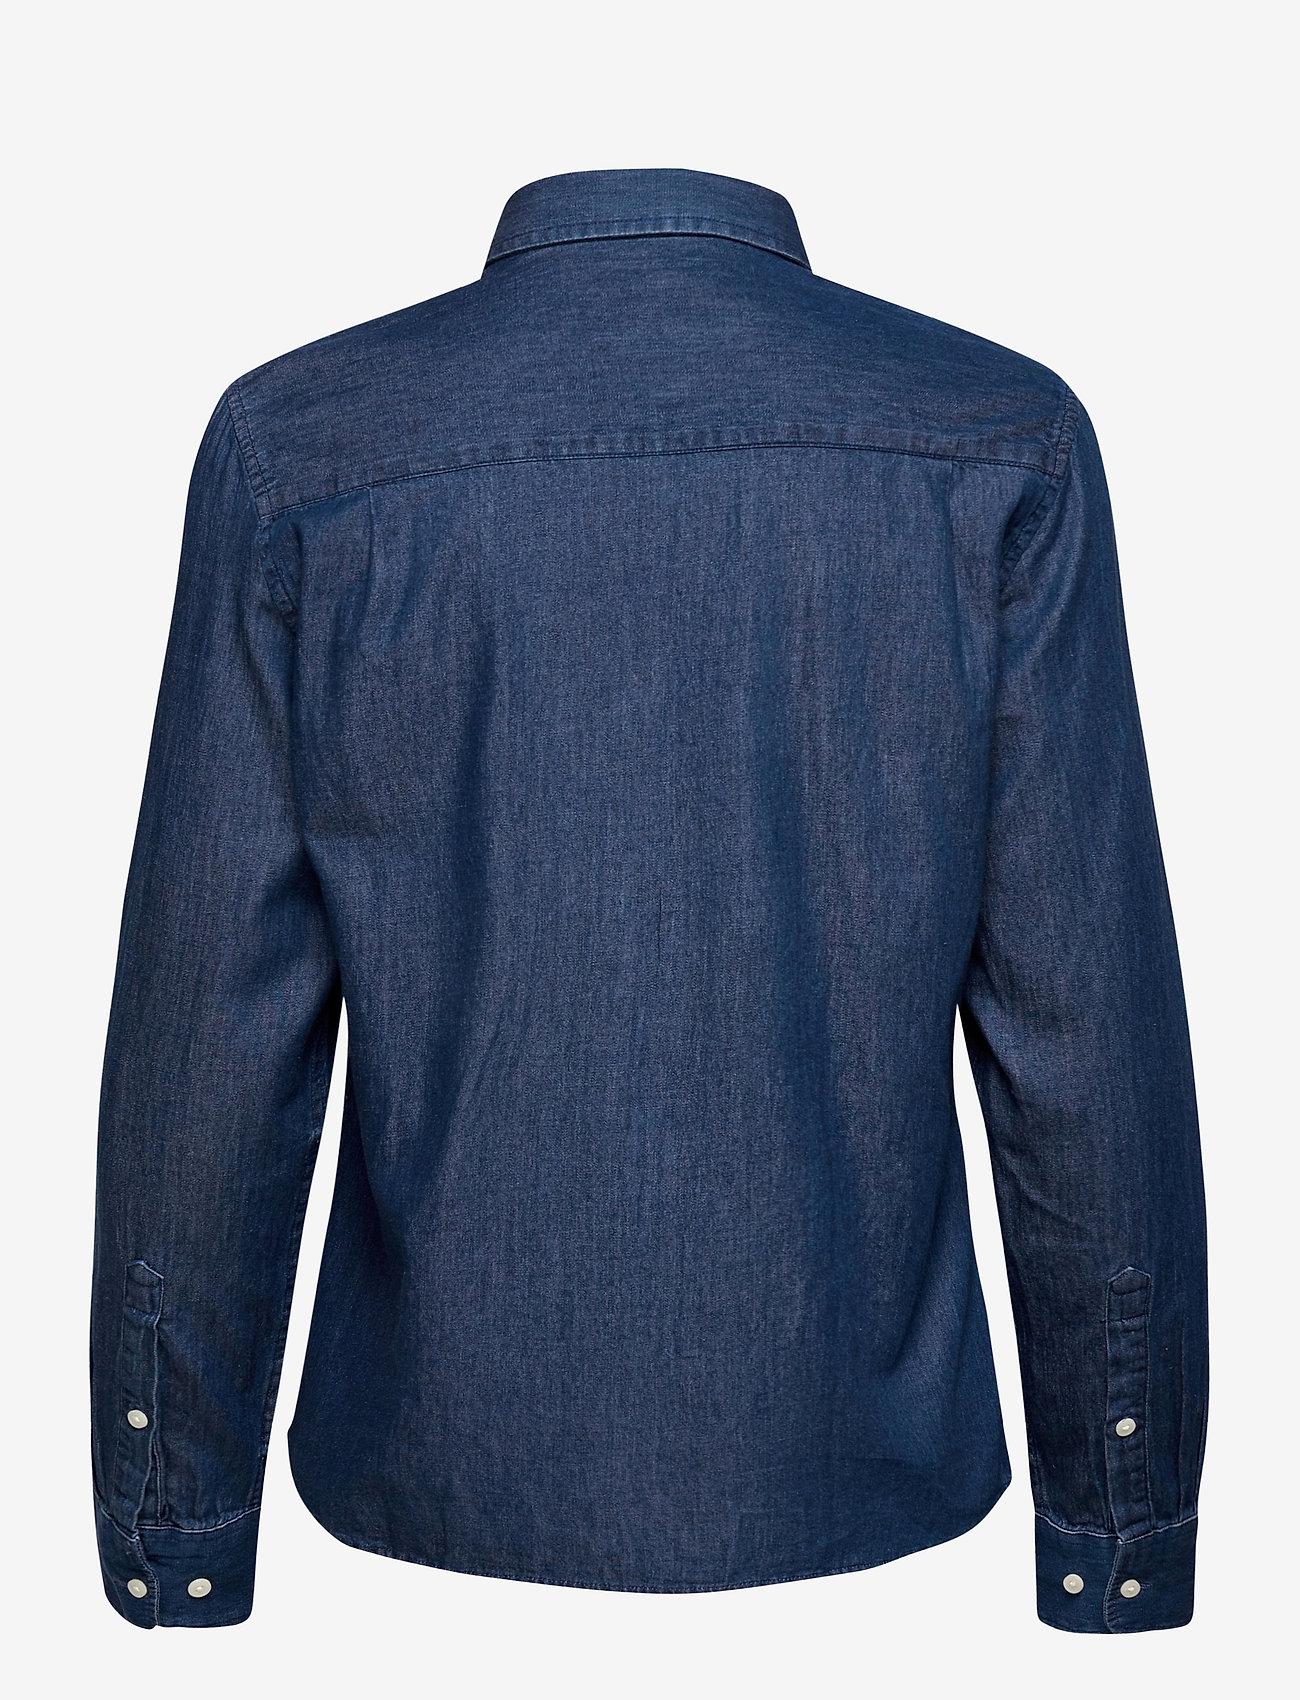 GANT - D1. LUXURY CHAMBRAY - jeansblouses - lt indigo - 1